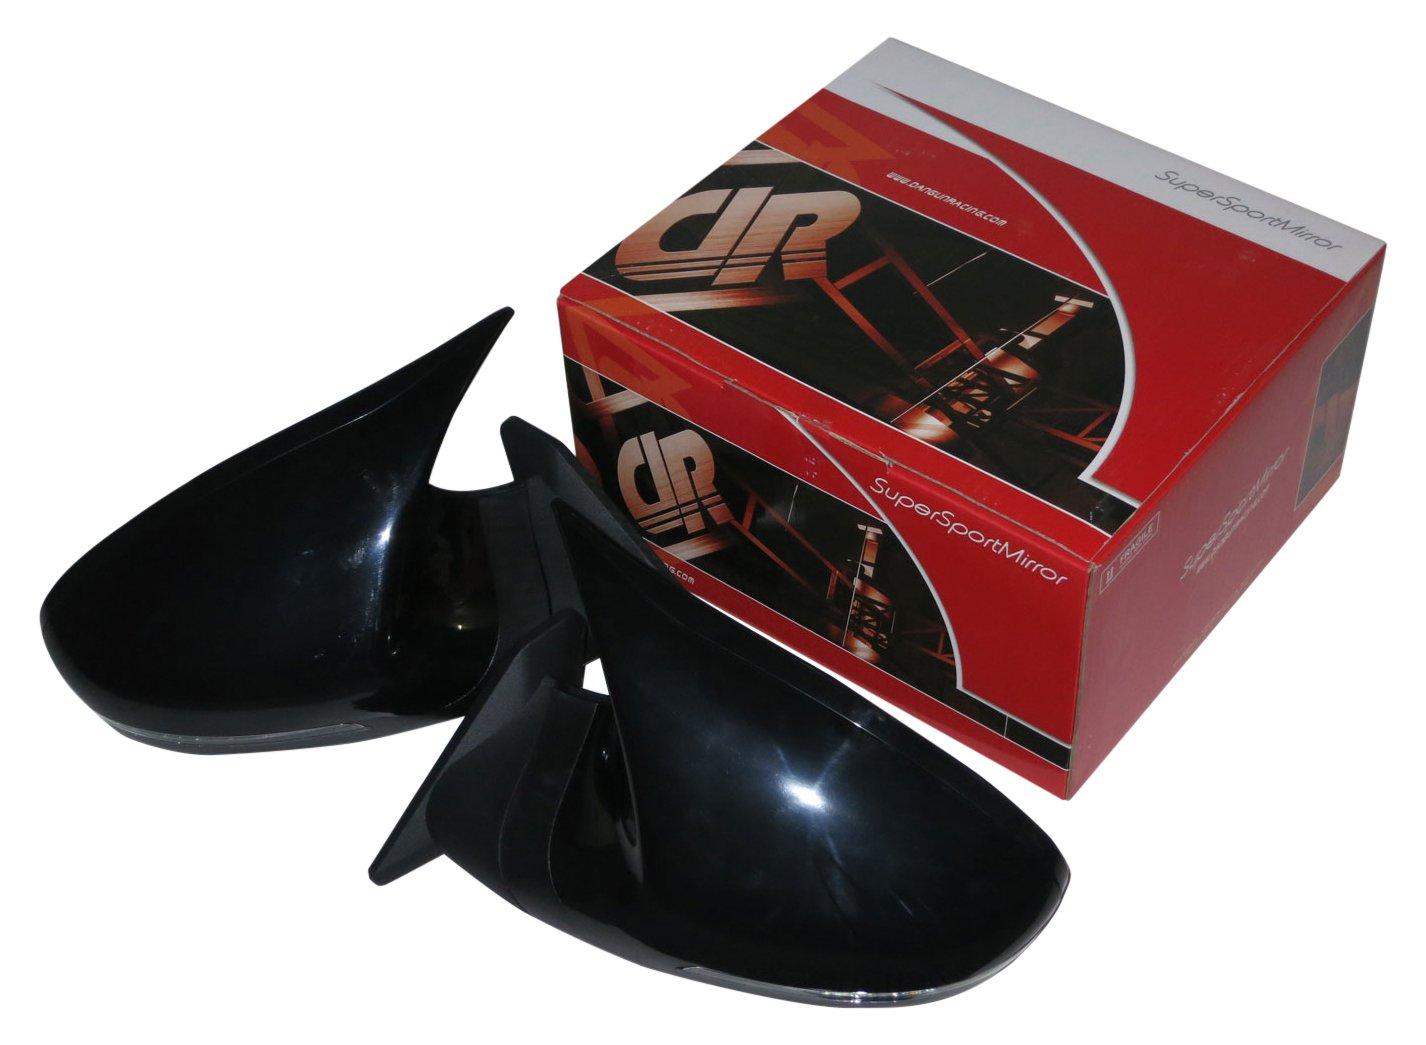 GTSミラー LED ブラック ミラー面電動調整 右ハンドル トヨタ ヴィッツ NCP/SCP10系 [1999~2005] SBMGTSBKALHR-1710 B0721SBSLC トヨタ ヴィッツ NCP/SCP10系 [1999~2005]|ブラック ブラック トヨタ ヴィッツ NCP/SCP10系 [1999~2005]